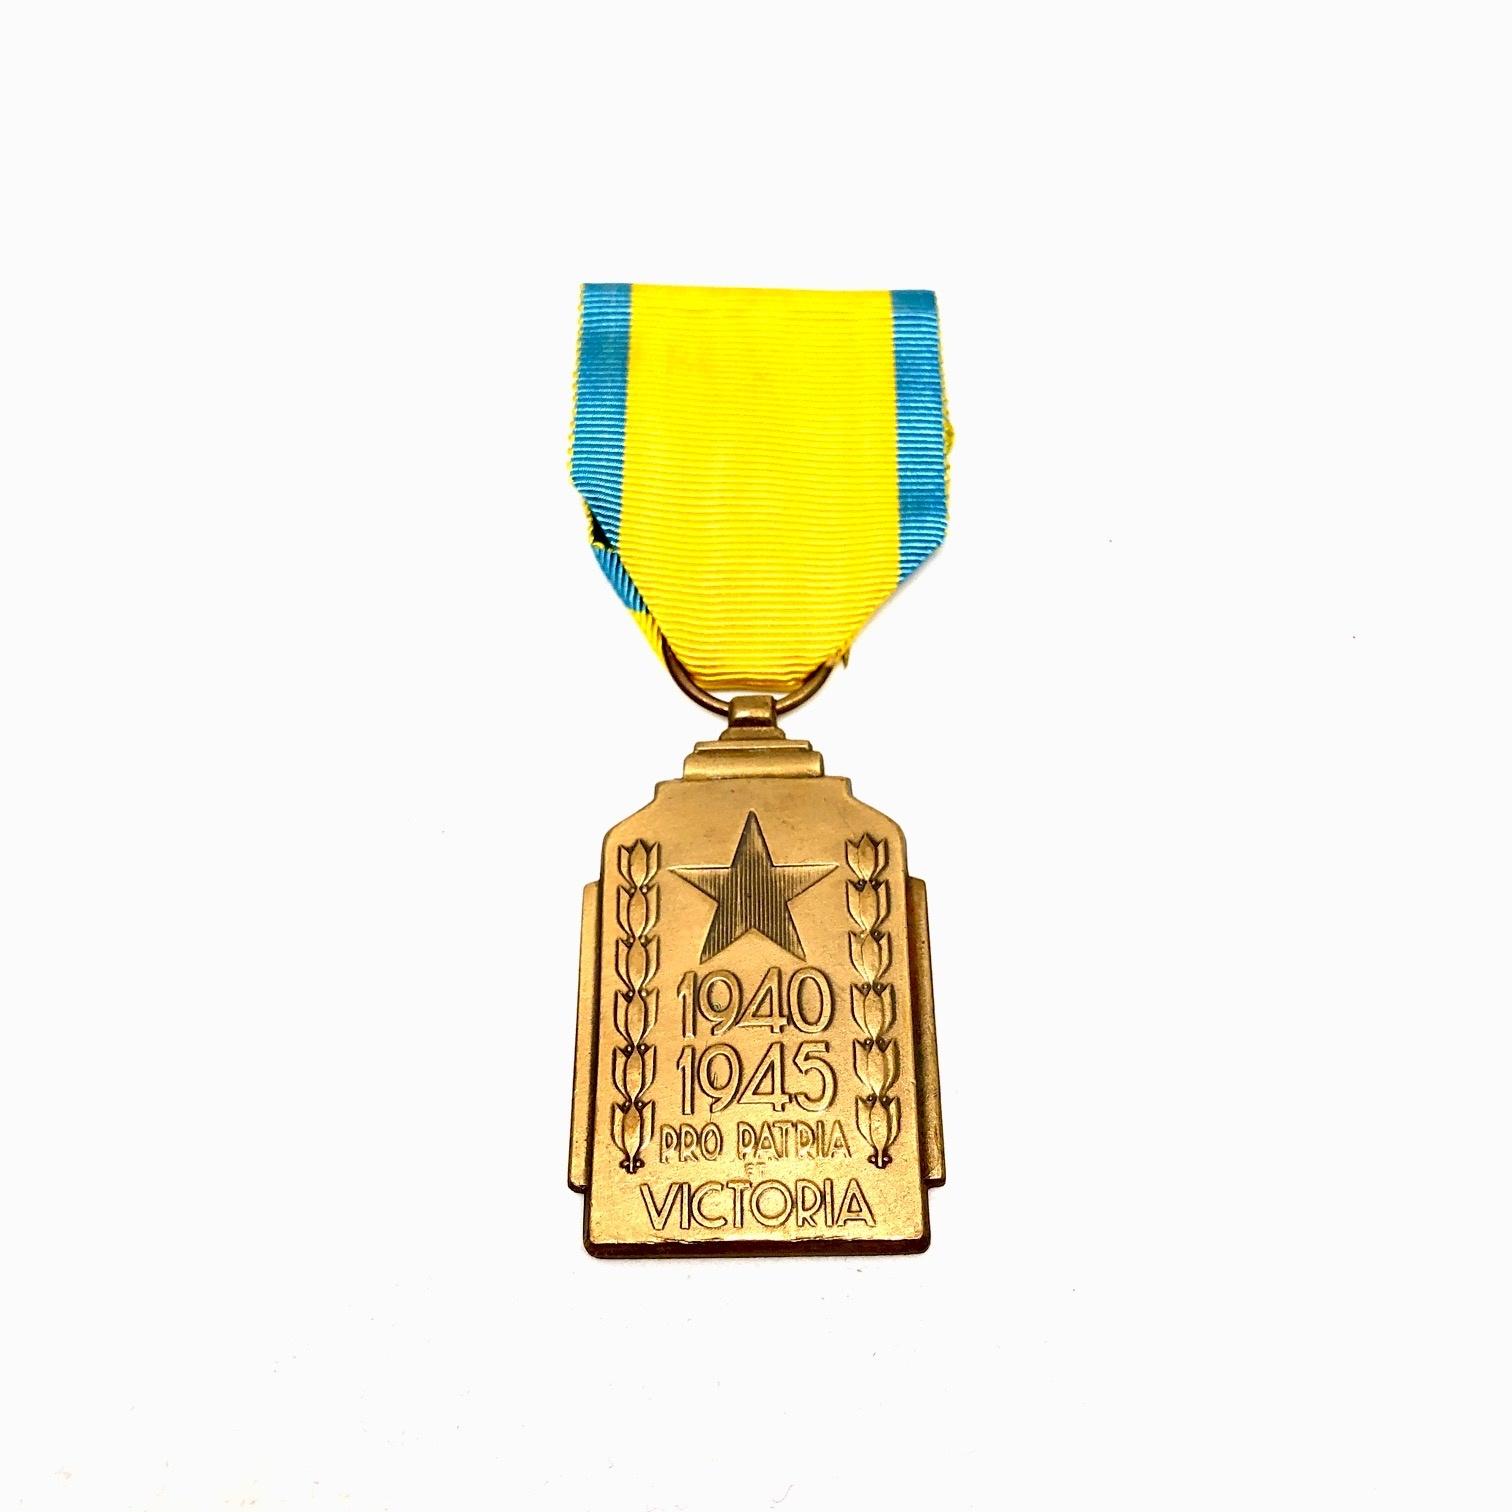 Colonial War Effort Medal 1940-1945